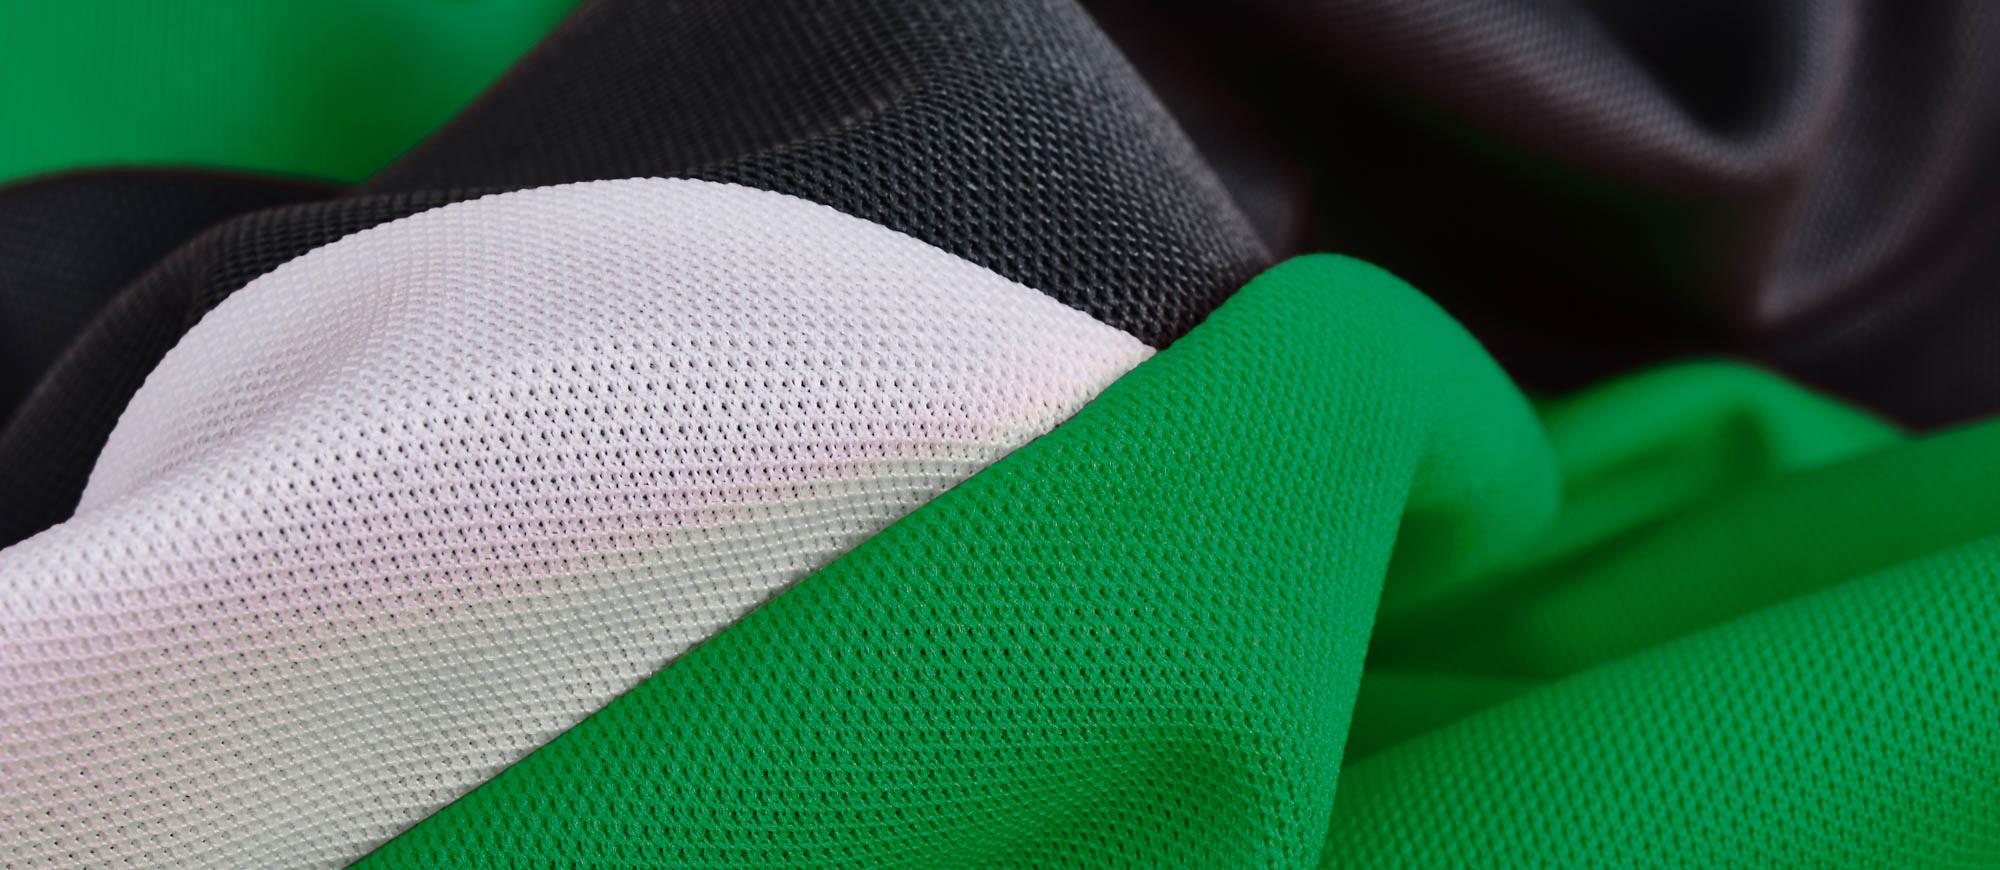 86a5ce9c5dc adidas Assita 17 Goalkeeper Jersey - Energy Green & White - Soccer ...